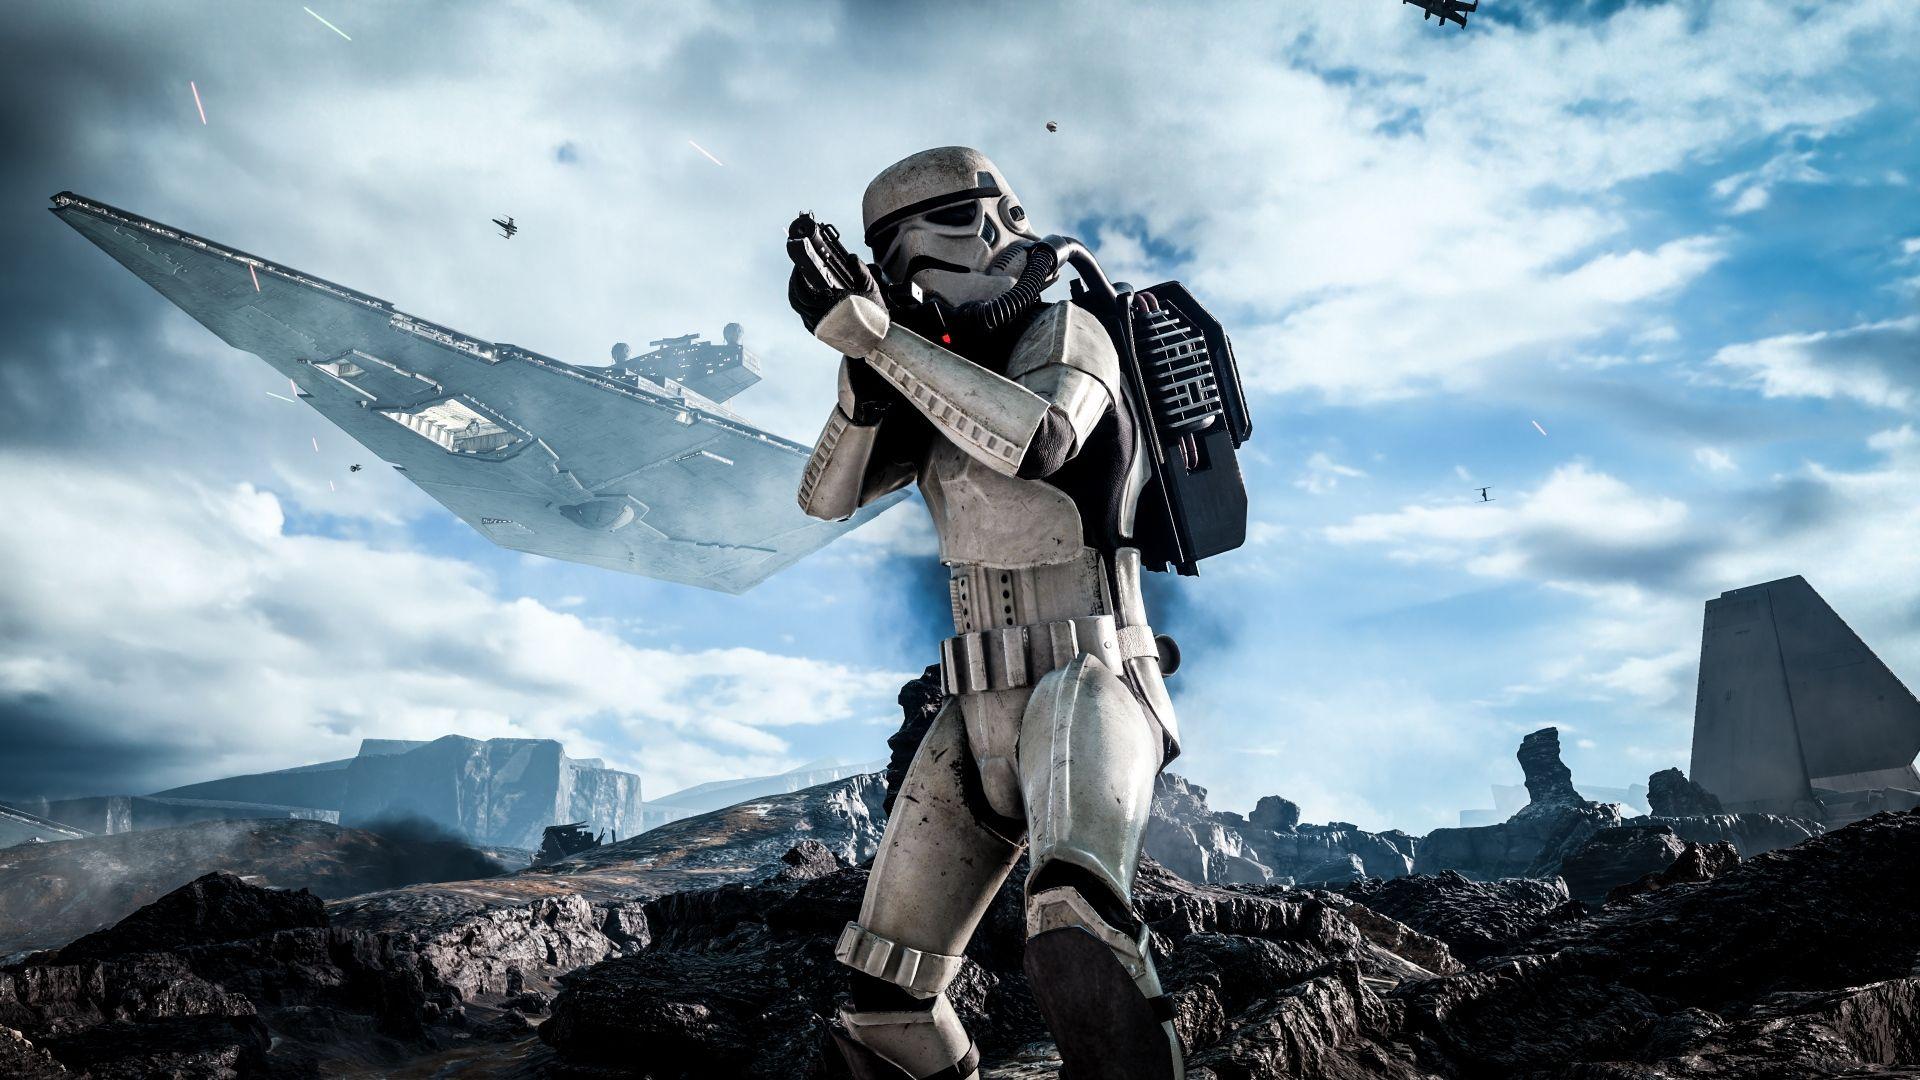 Full Hd 1080p Star Wars Wallpapers Hd Desktop Backgrounds Epic